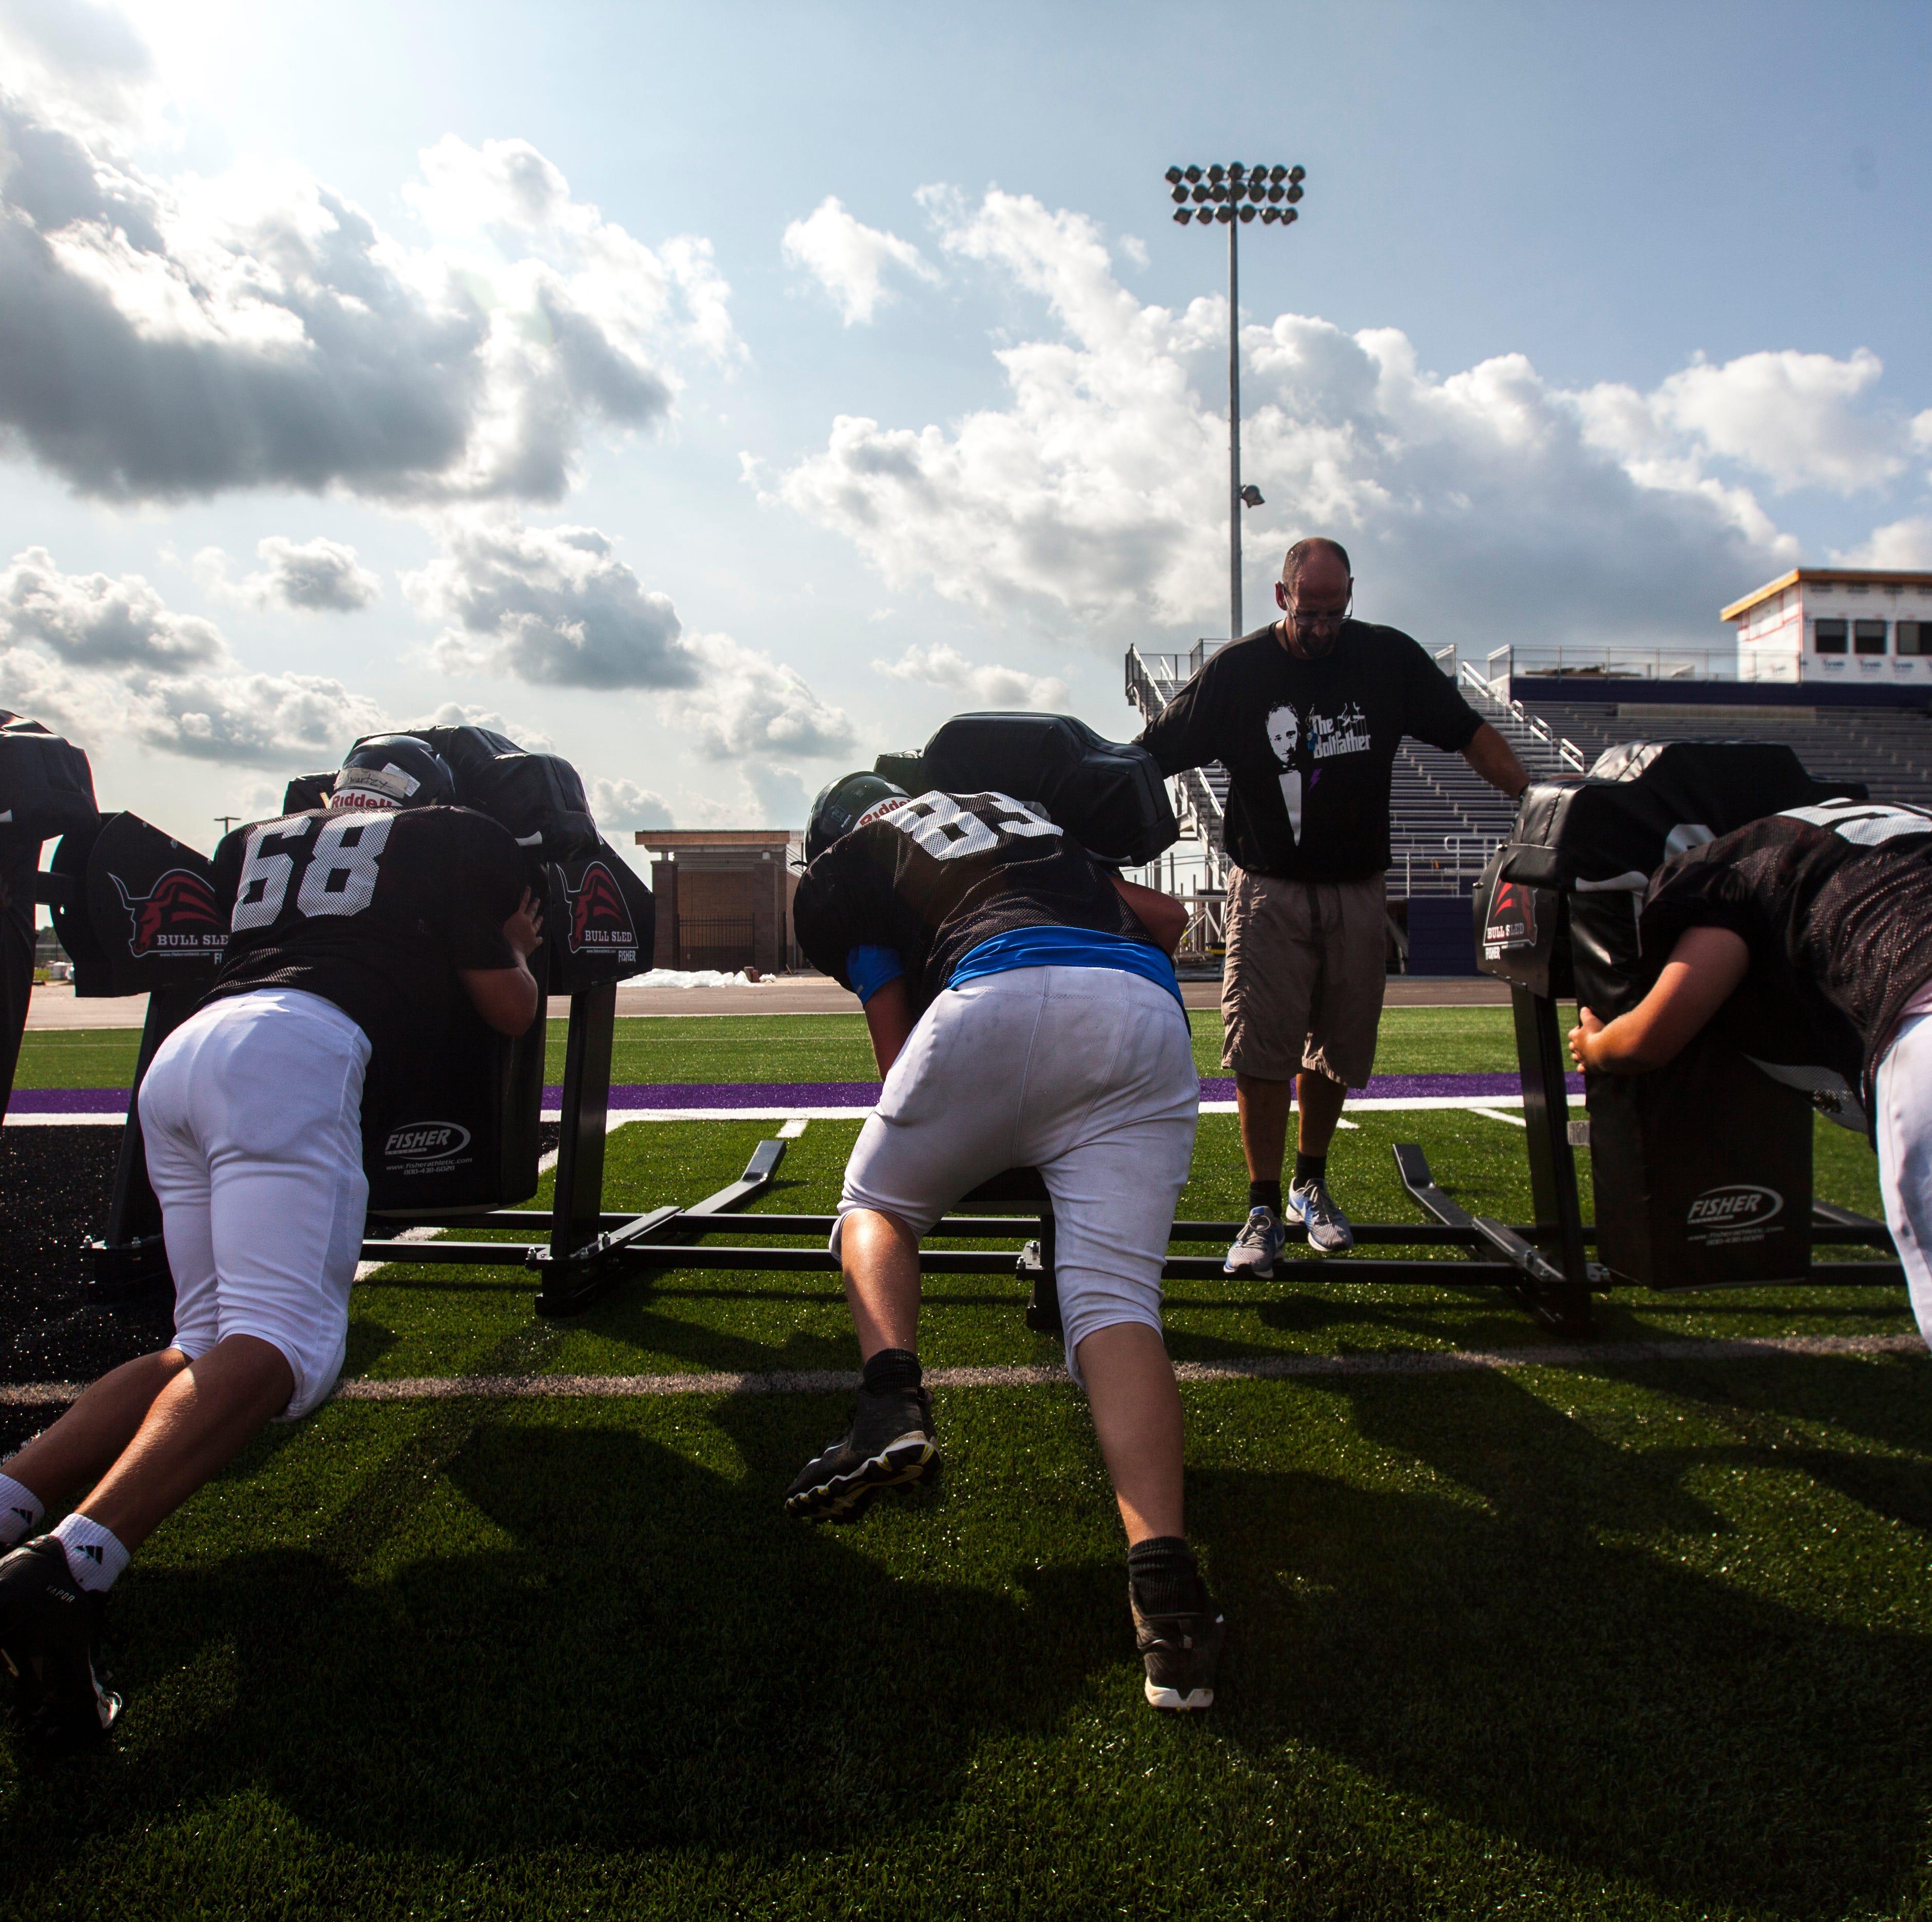 Ahead of varsity debut, Iowa City Liberty ready to begin football legacy